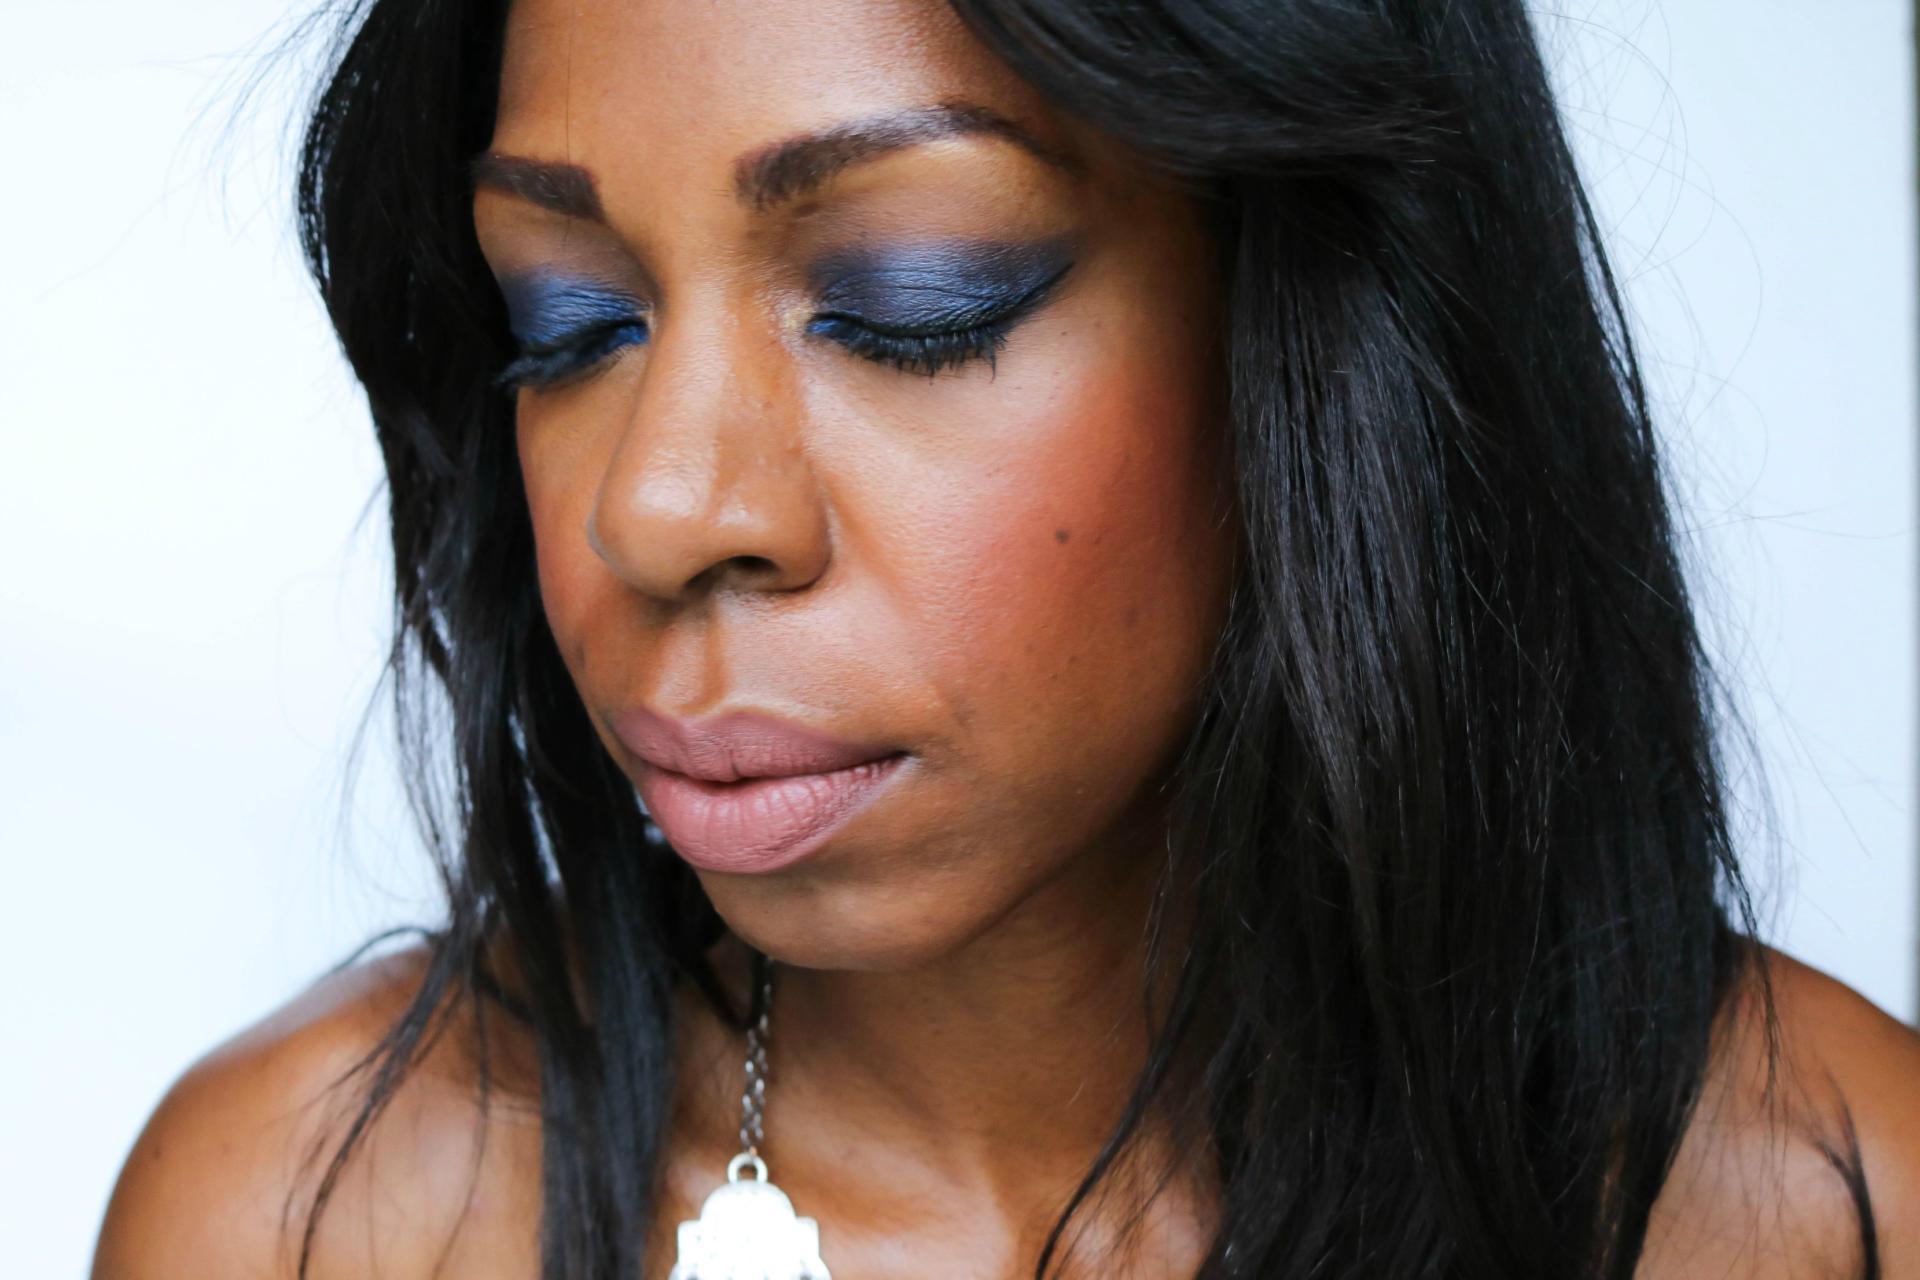 MAC Cosmetics - Spellbinder Eyeshadows